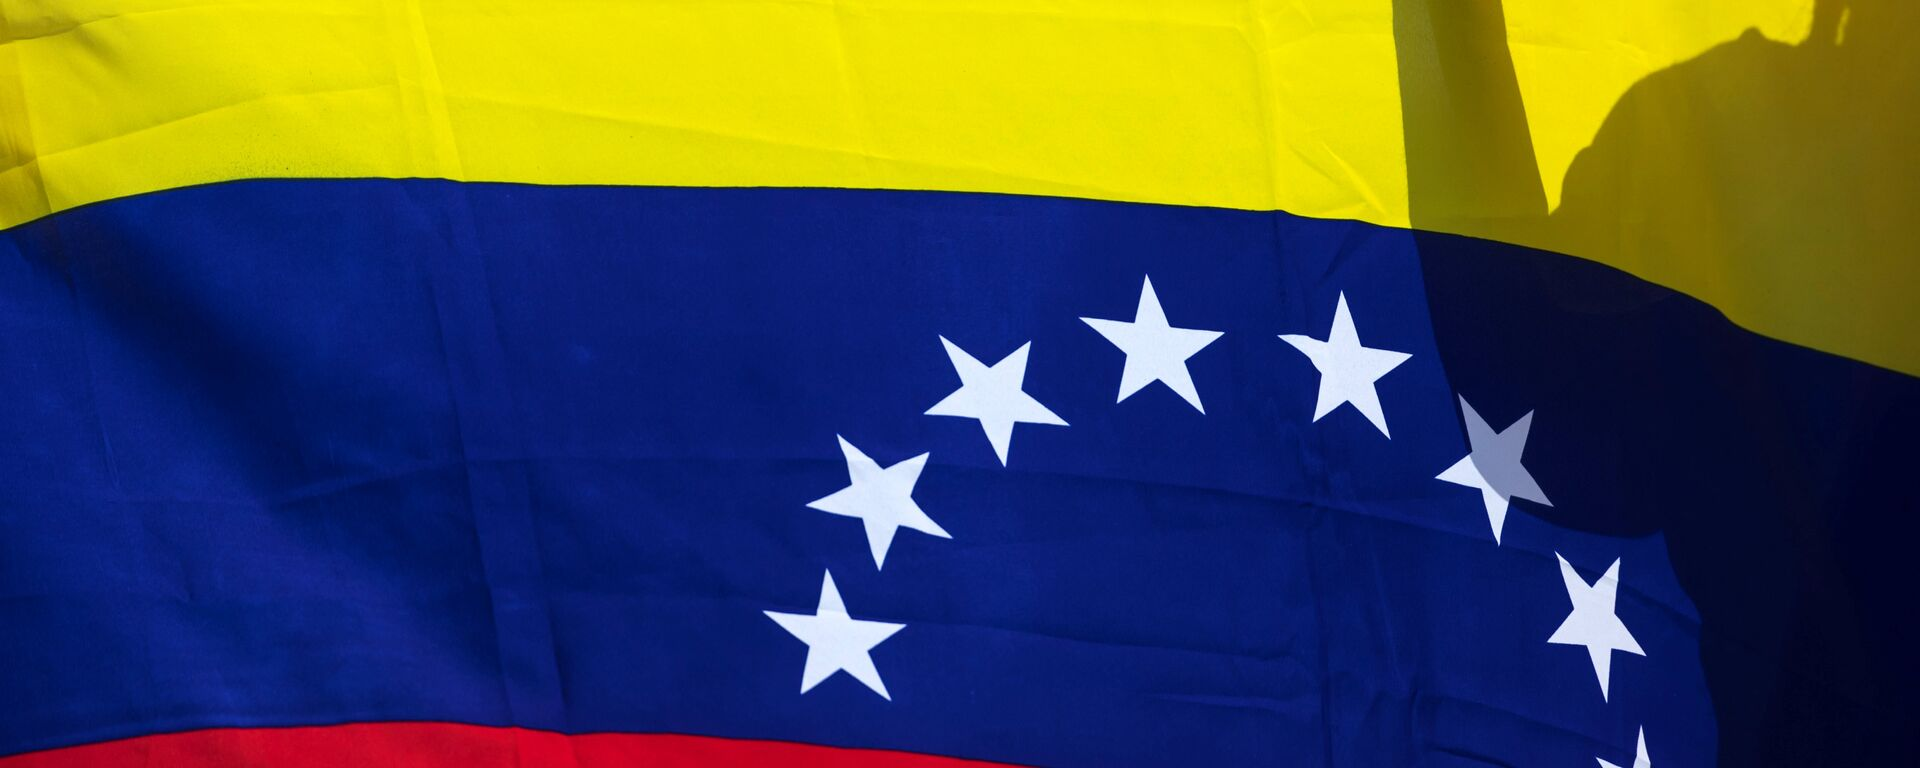 Bandera de Venezuela - Sputnik Mundo, 1920, 04.05.2021